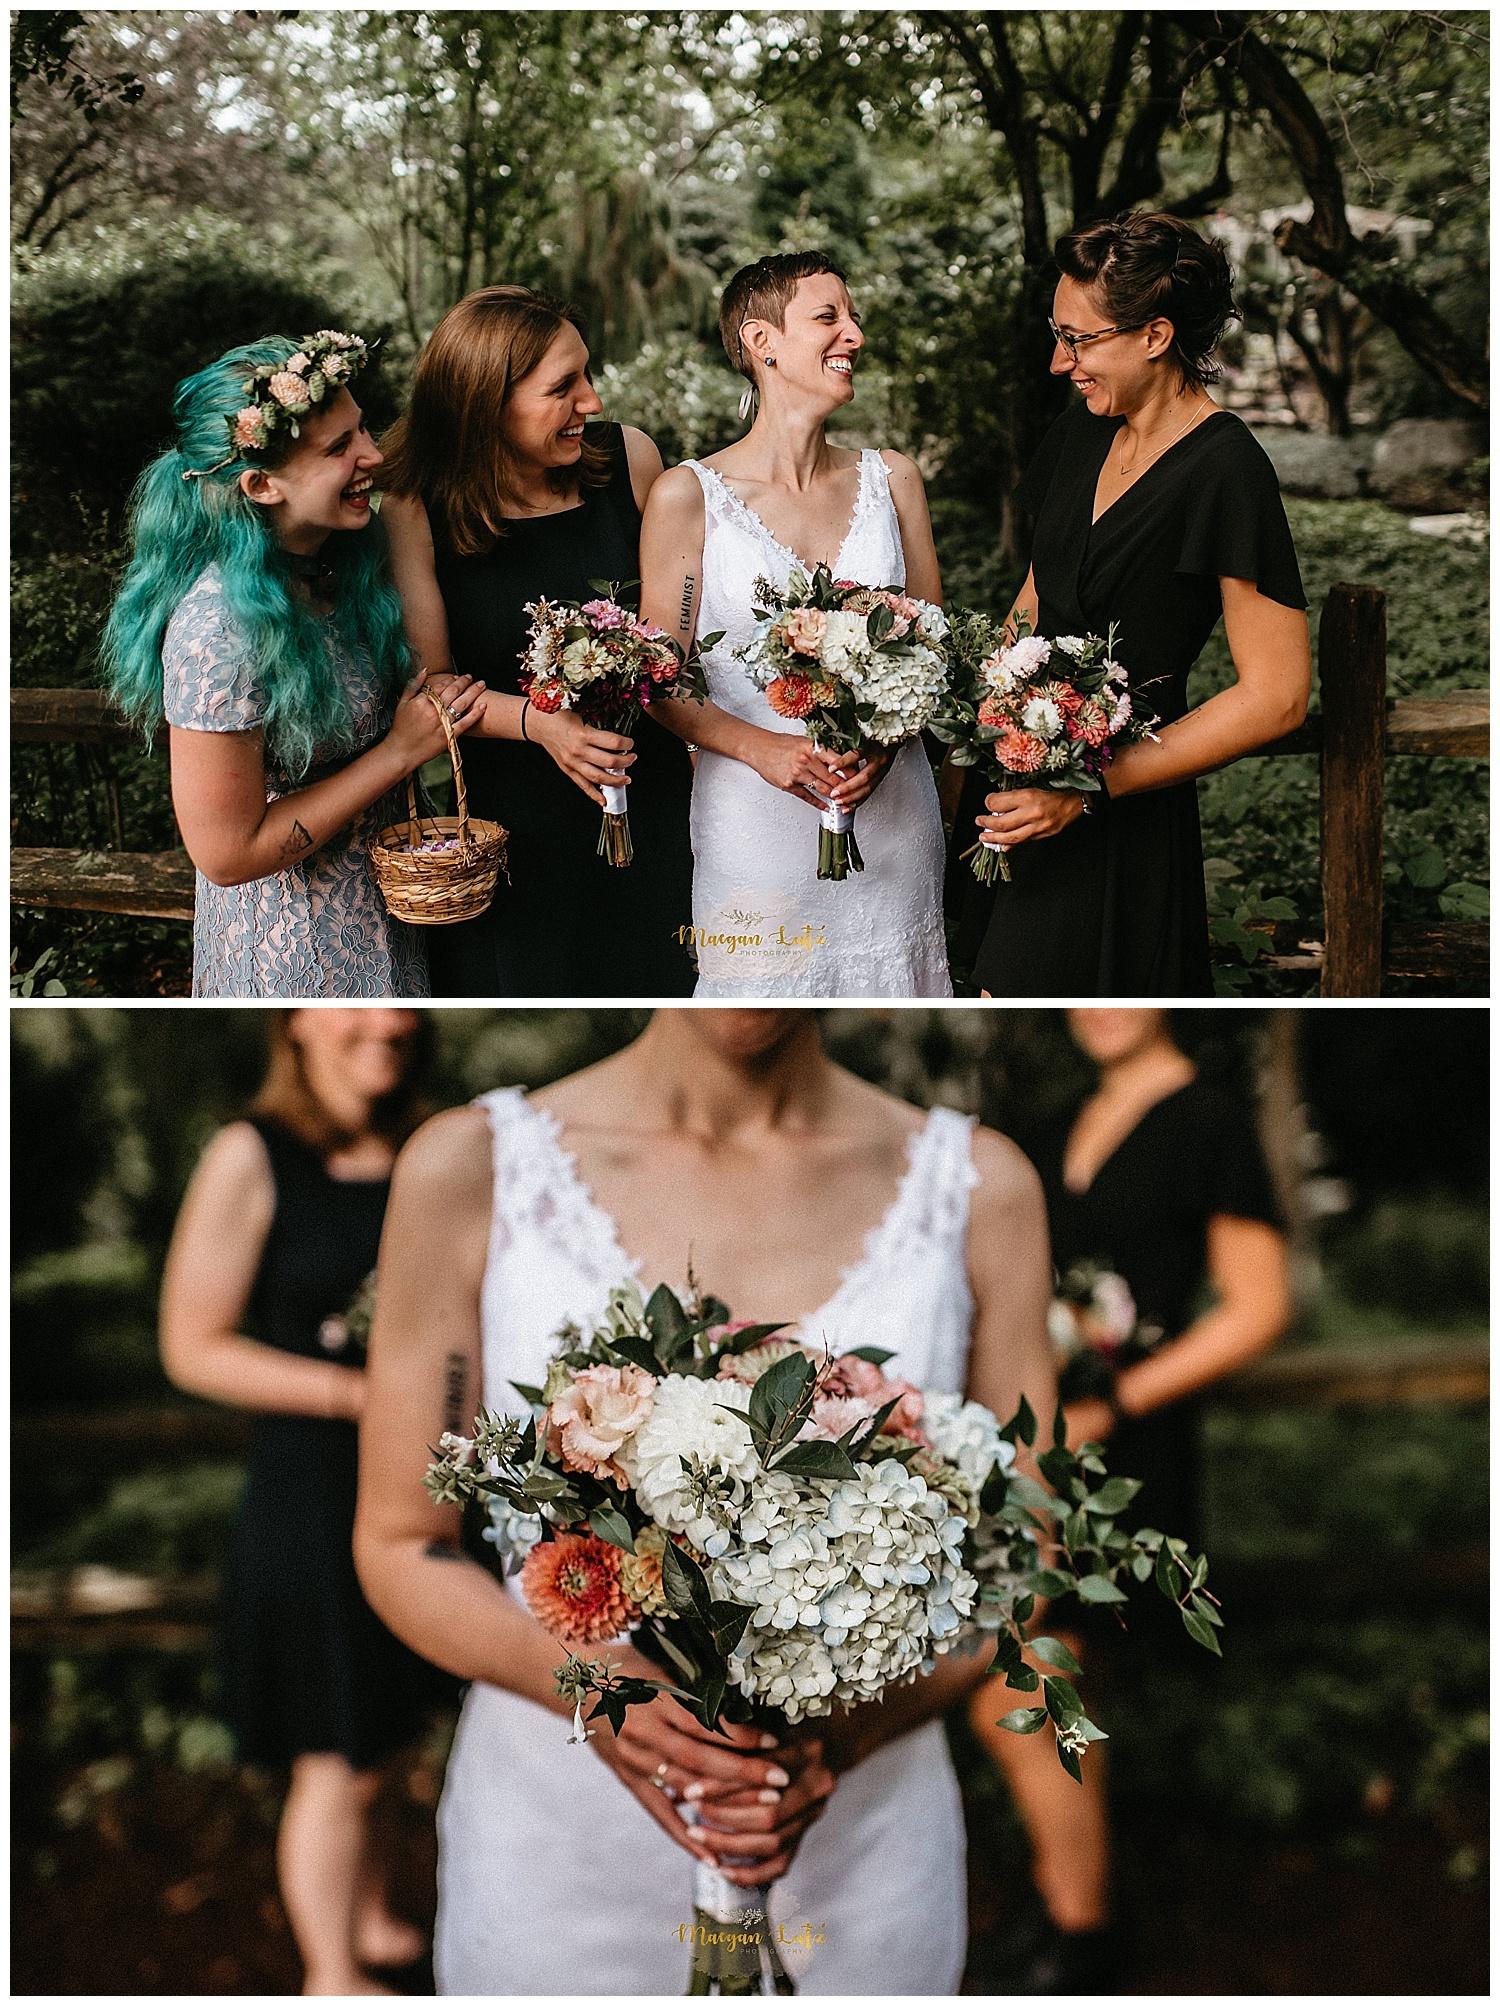 NEPA-Wedding-Photographer-at-Carmens-Country-Inn-and-Gardens-Drums-PA_0015.jpg